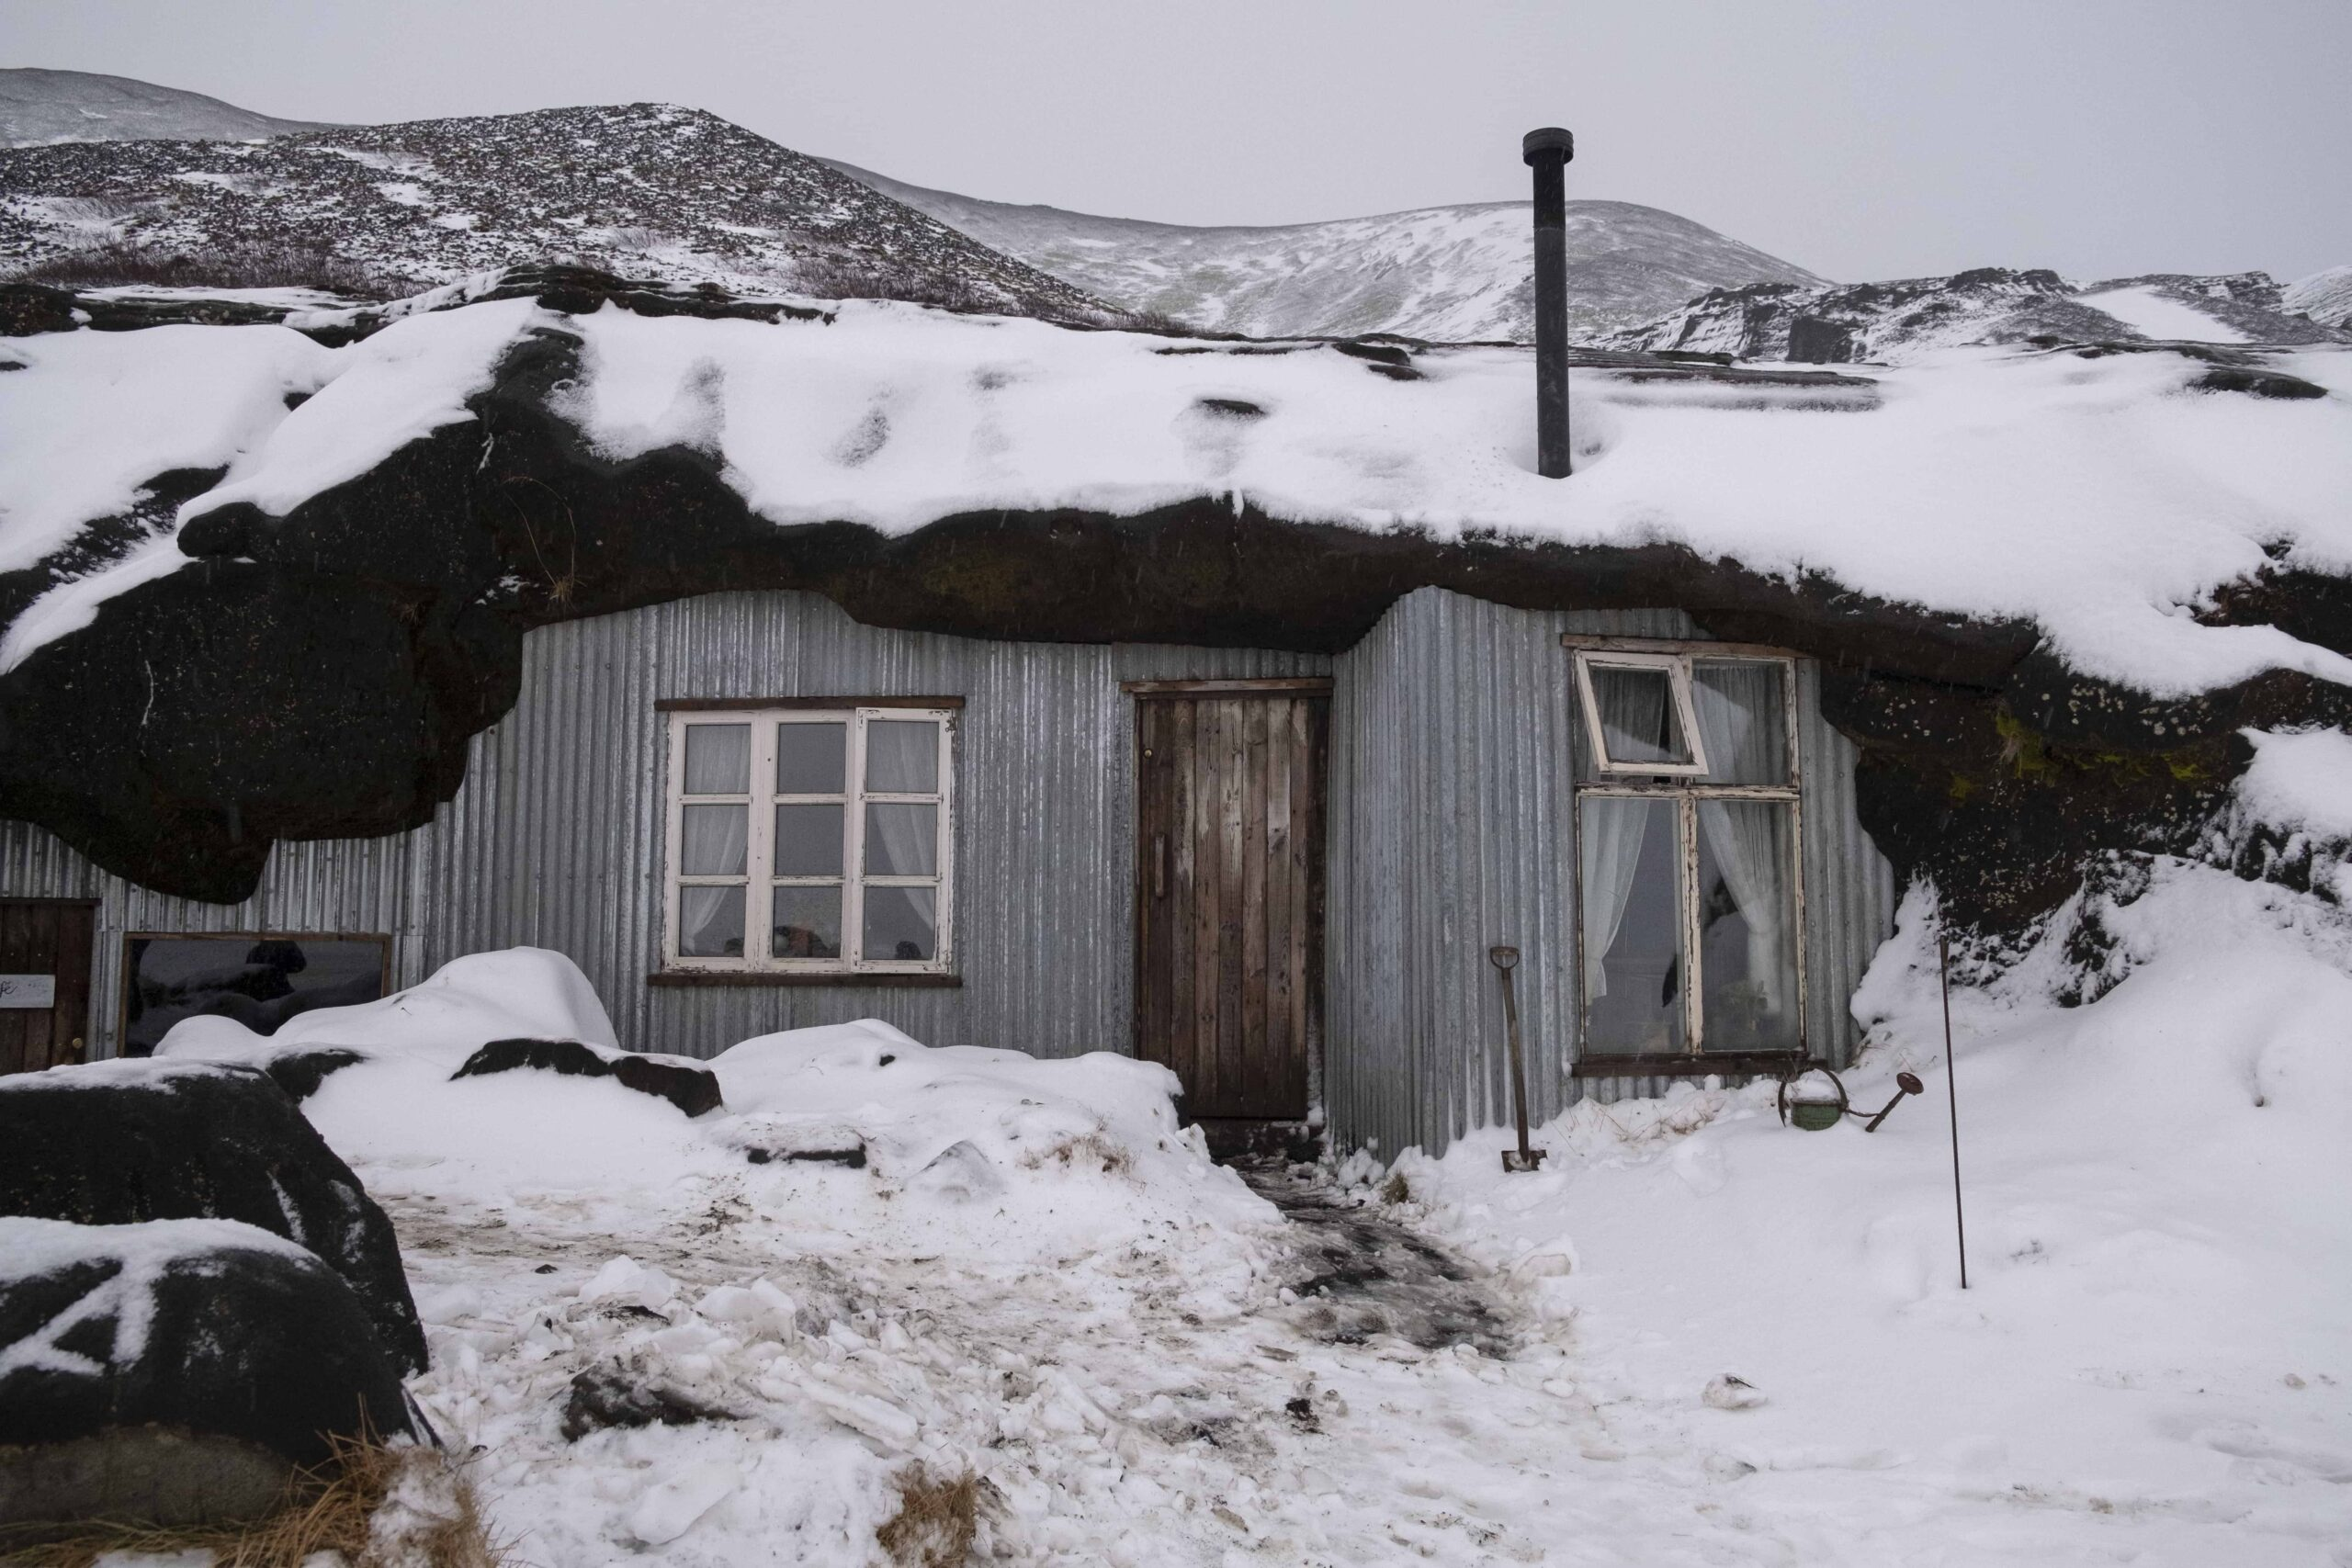 Ingólfshöfði in south Iceland